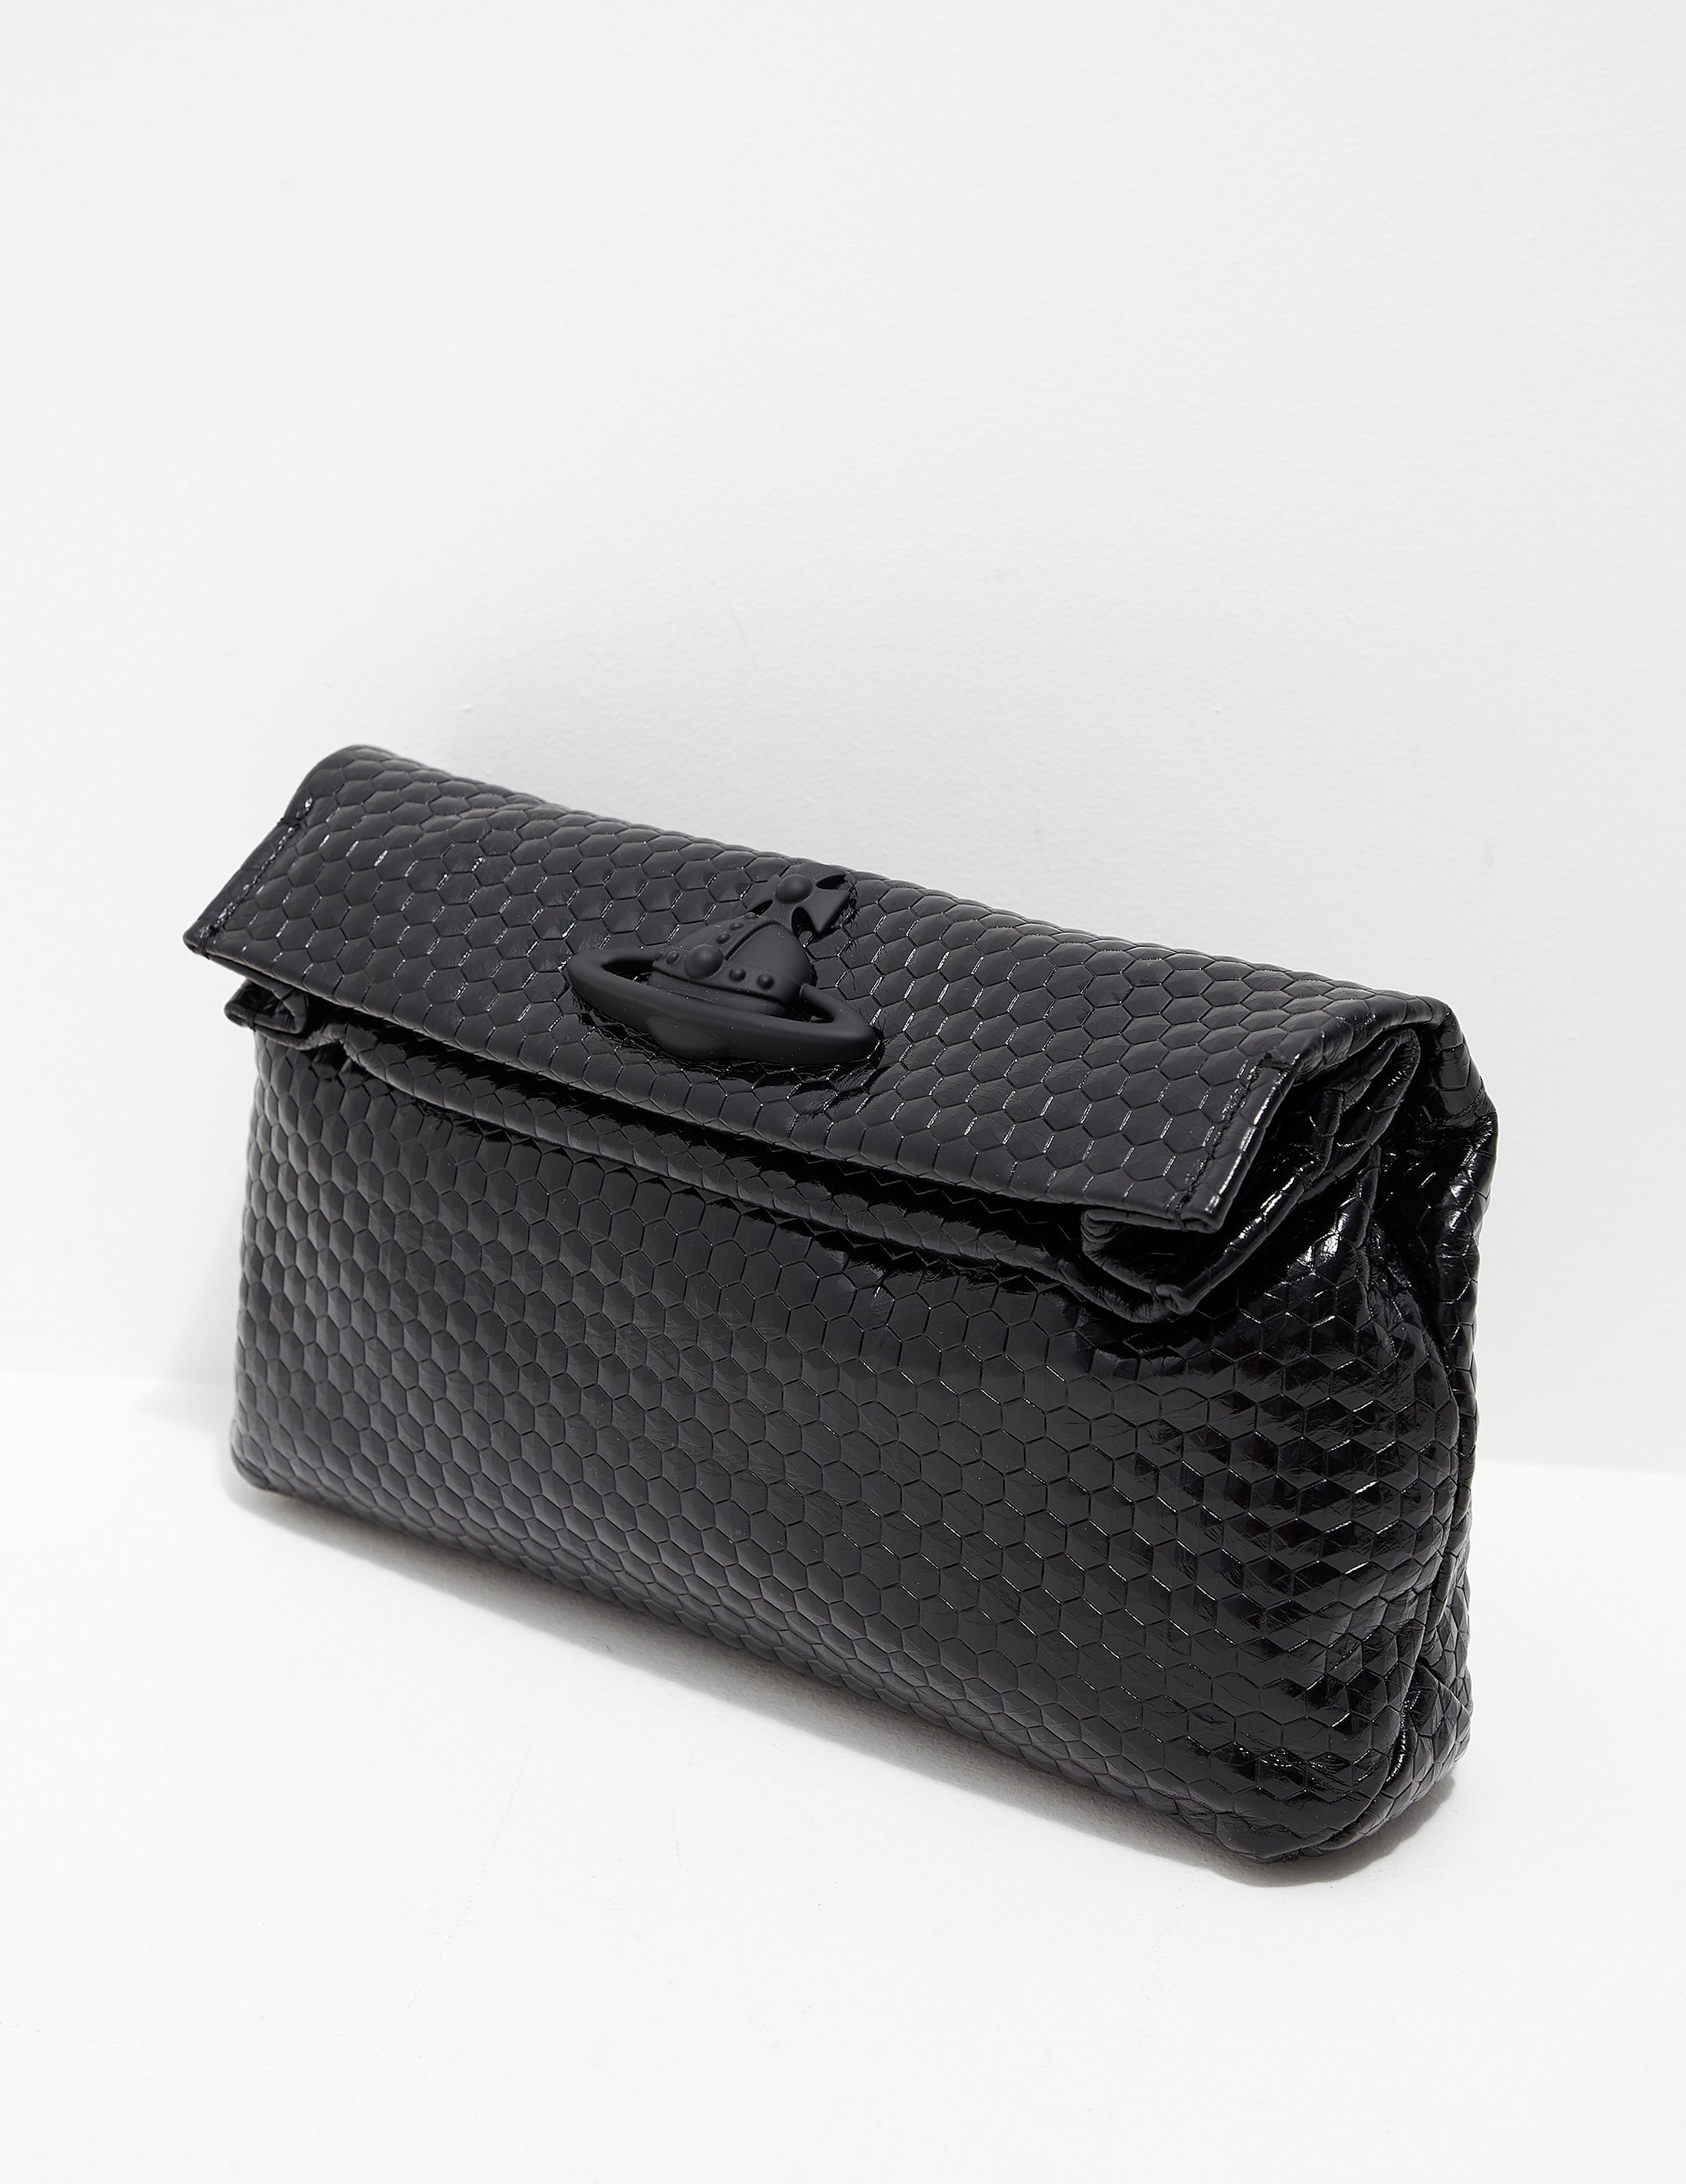 Vivienne Westwood Eva Clutch Bag - Online Exclusive